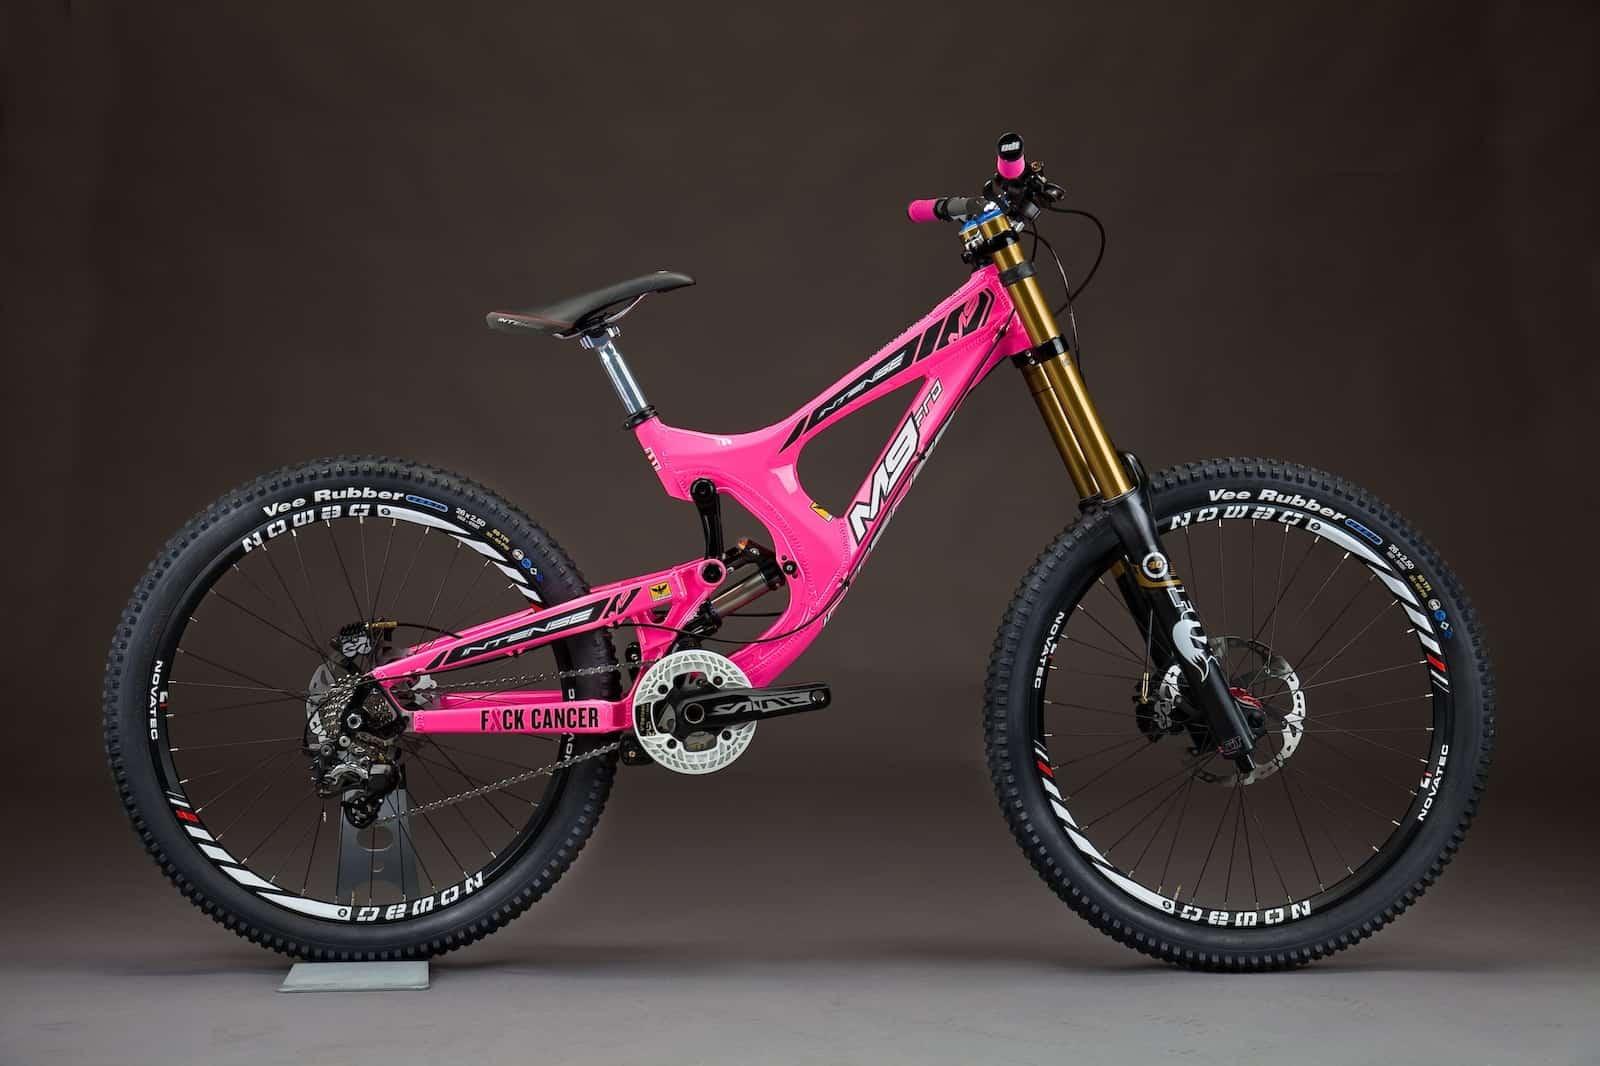 New Intense Prototype? - Pinkbike Forum